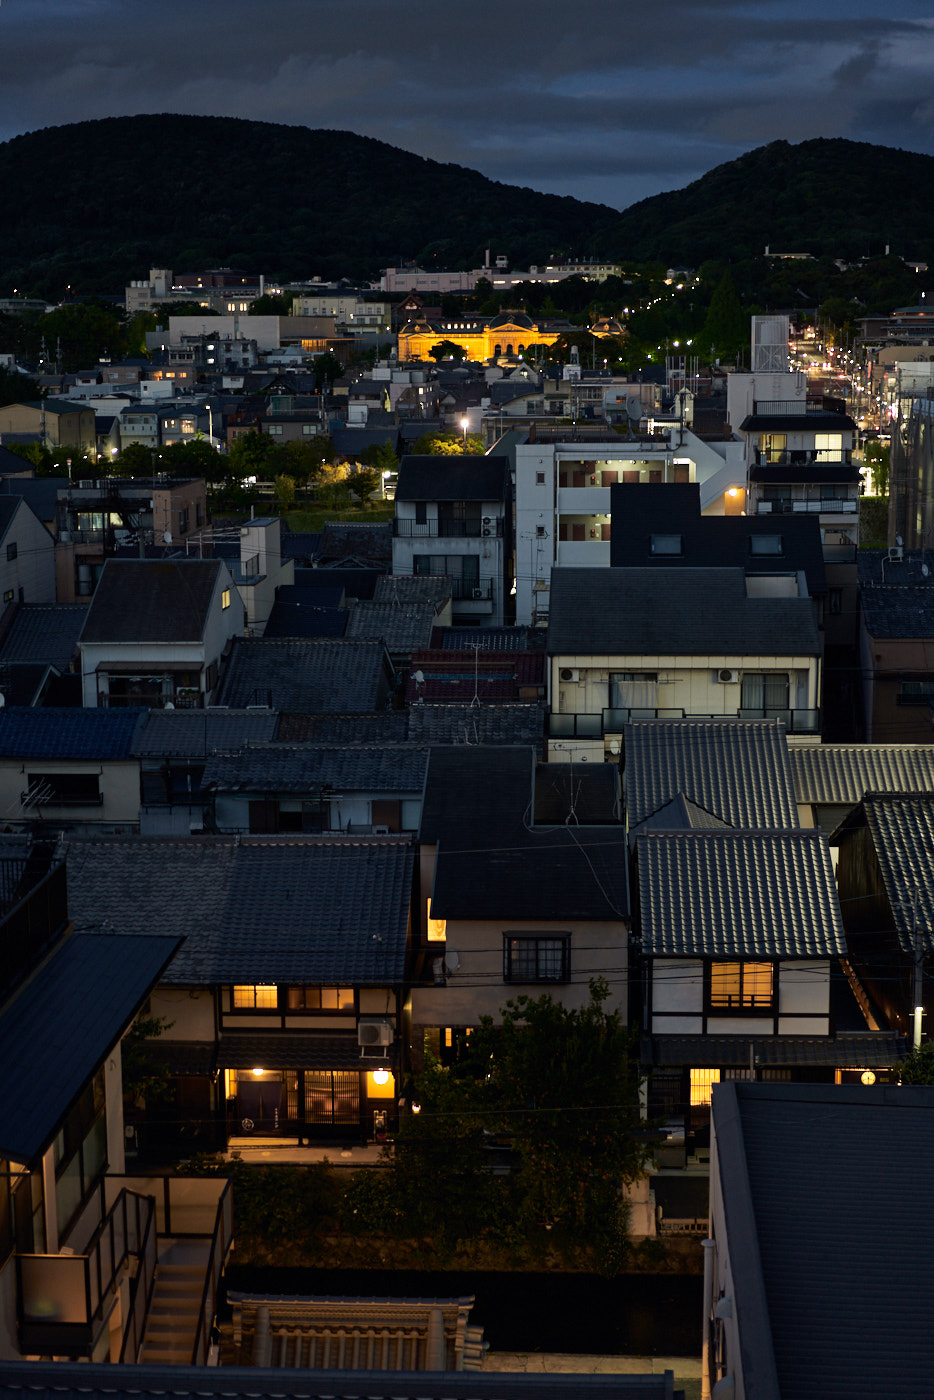 japan_2018_kyoto_raw 320_klein.jpg